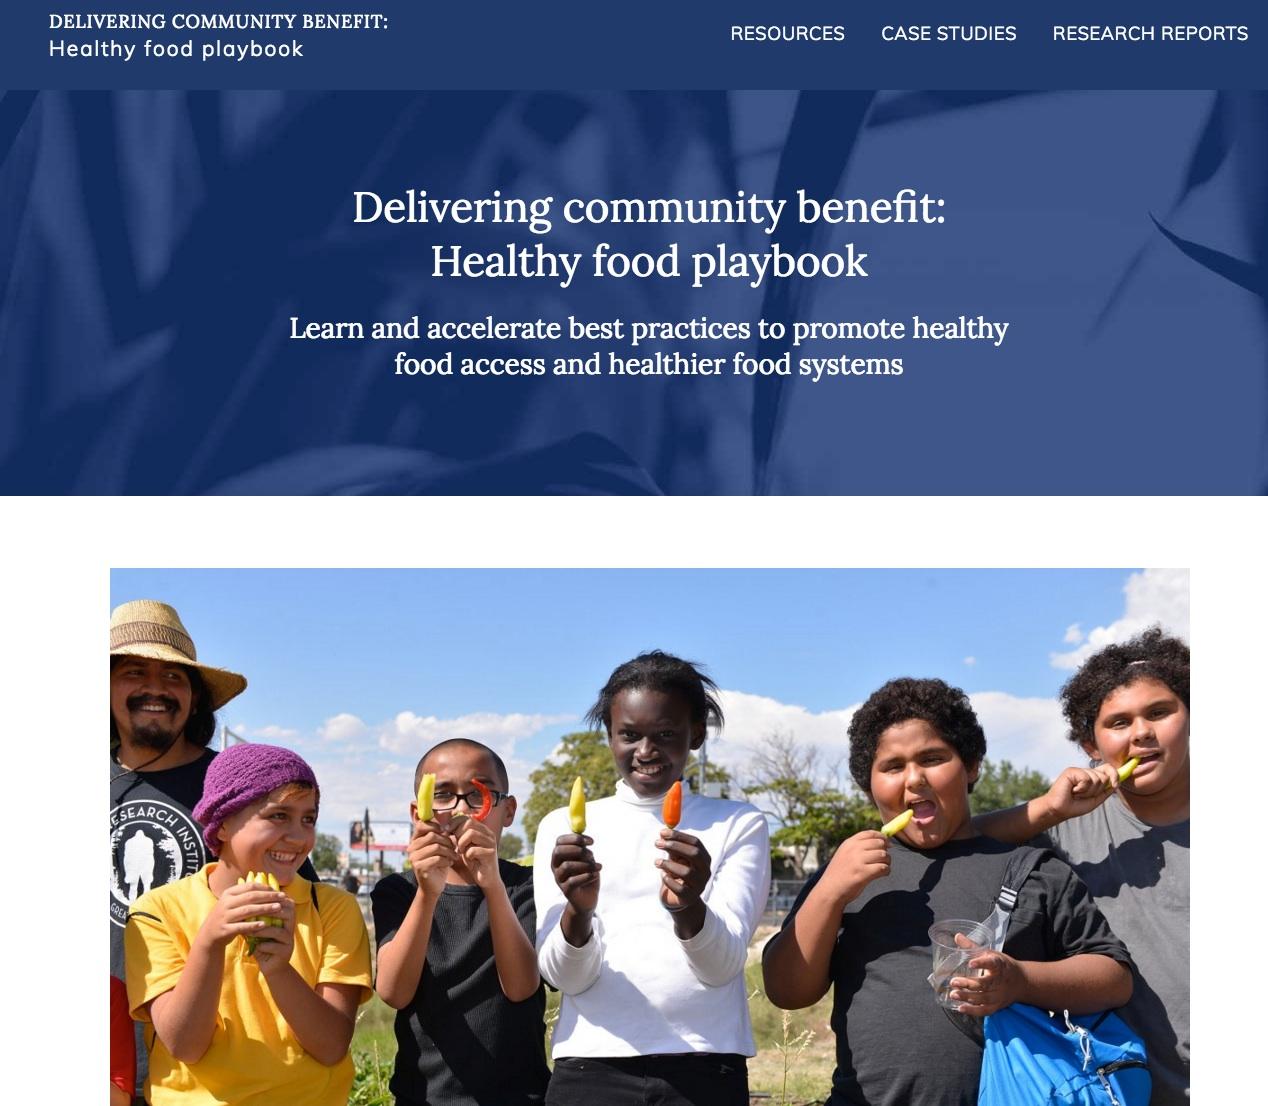 Delivering_community_benefit__Healthy_food_playbook___Healthy_food_playbook.jpg